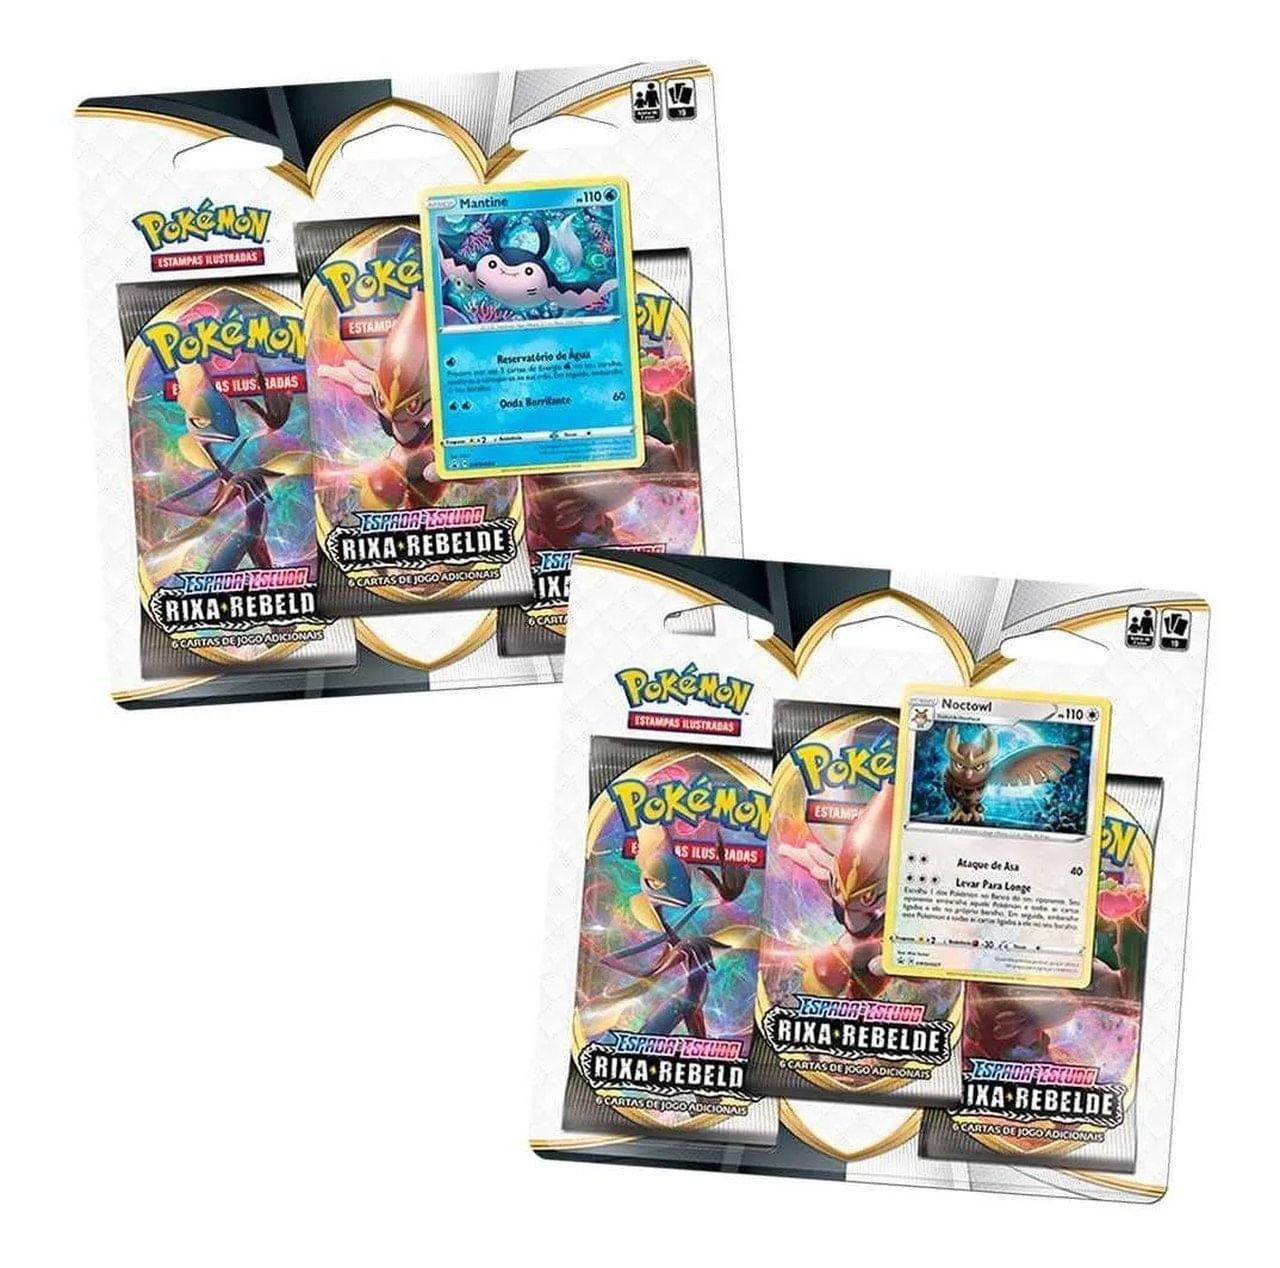 Pokémon 2 Blister Triplo Mantine Noctowl Rixa Rebelde Copag